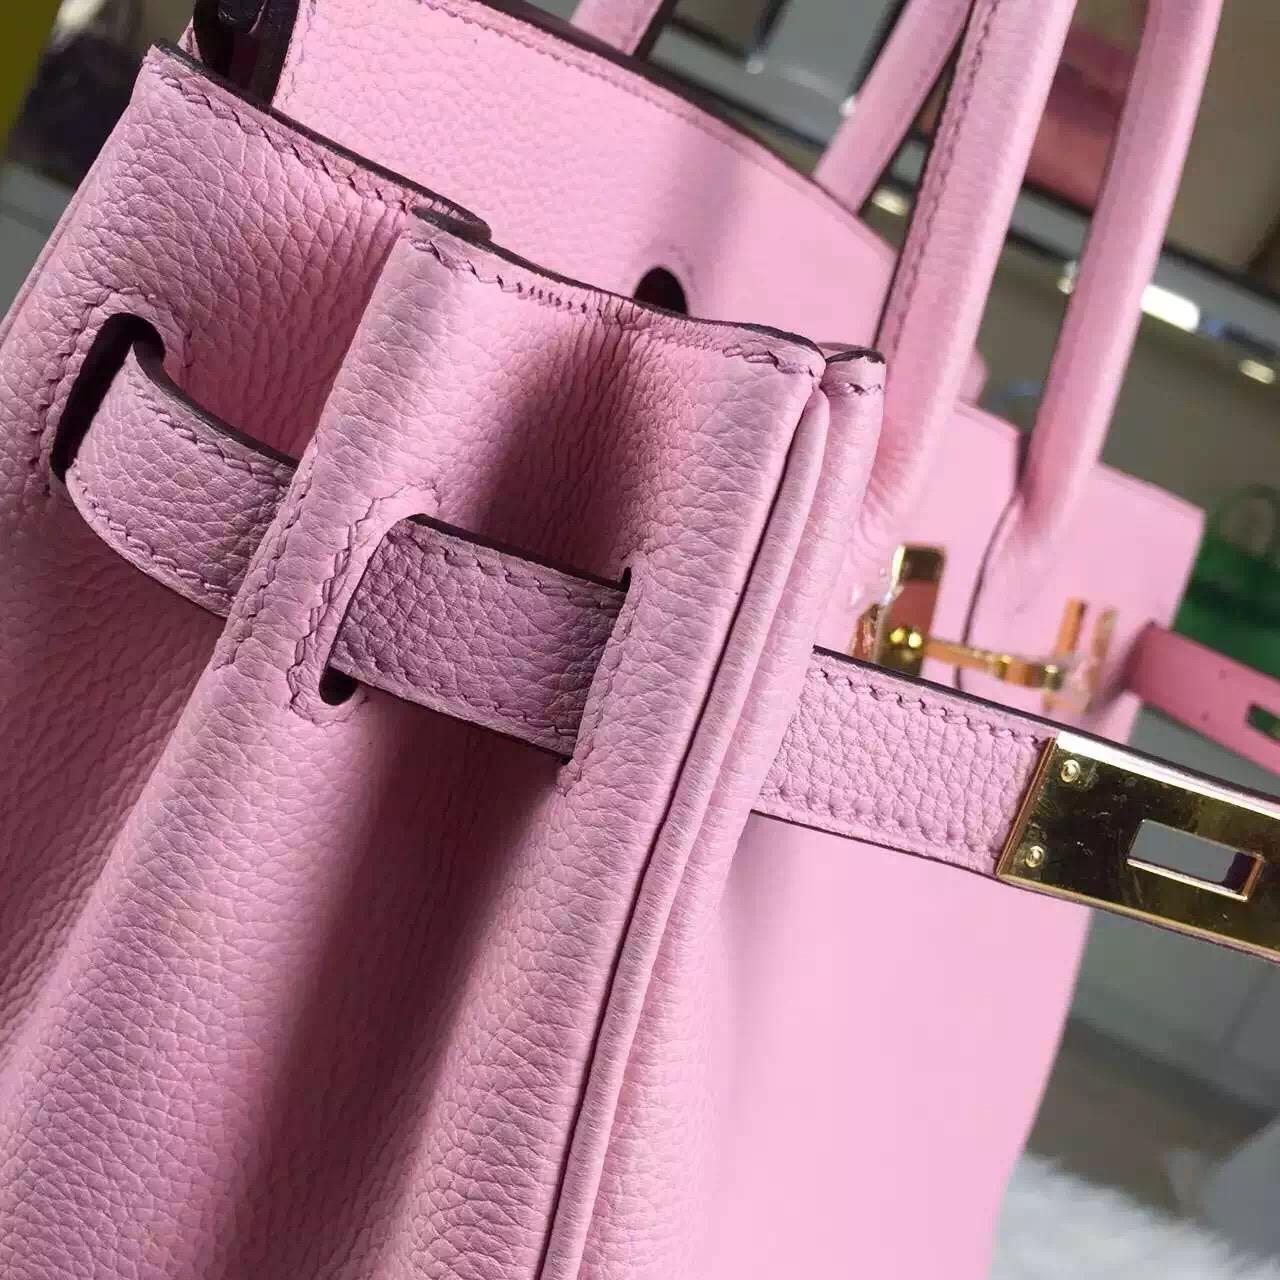 2015 New Pretty Hermes 3Q Rose Sakura France Togo Leather Birkin Bag 30CM